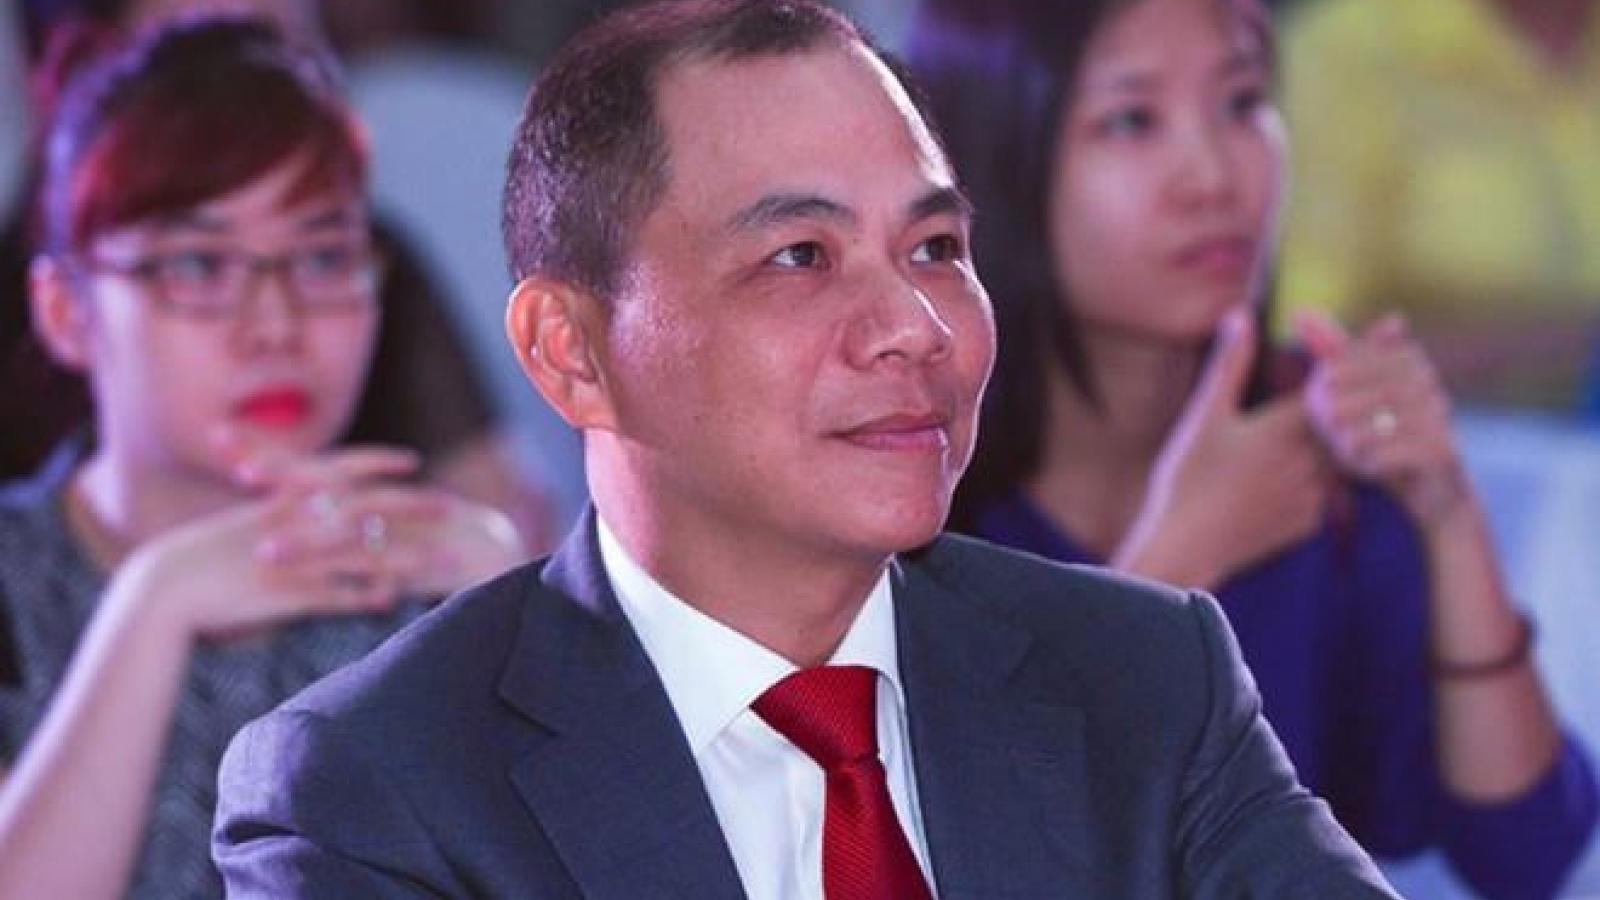 How rich are Vietnamese dollar billionaires?